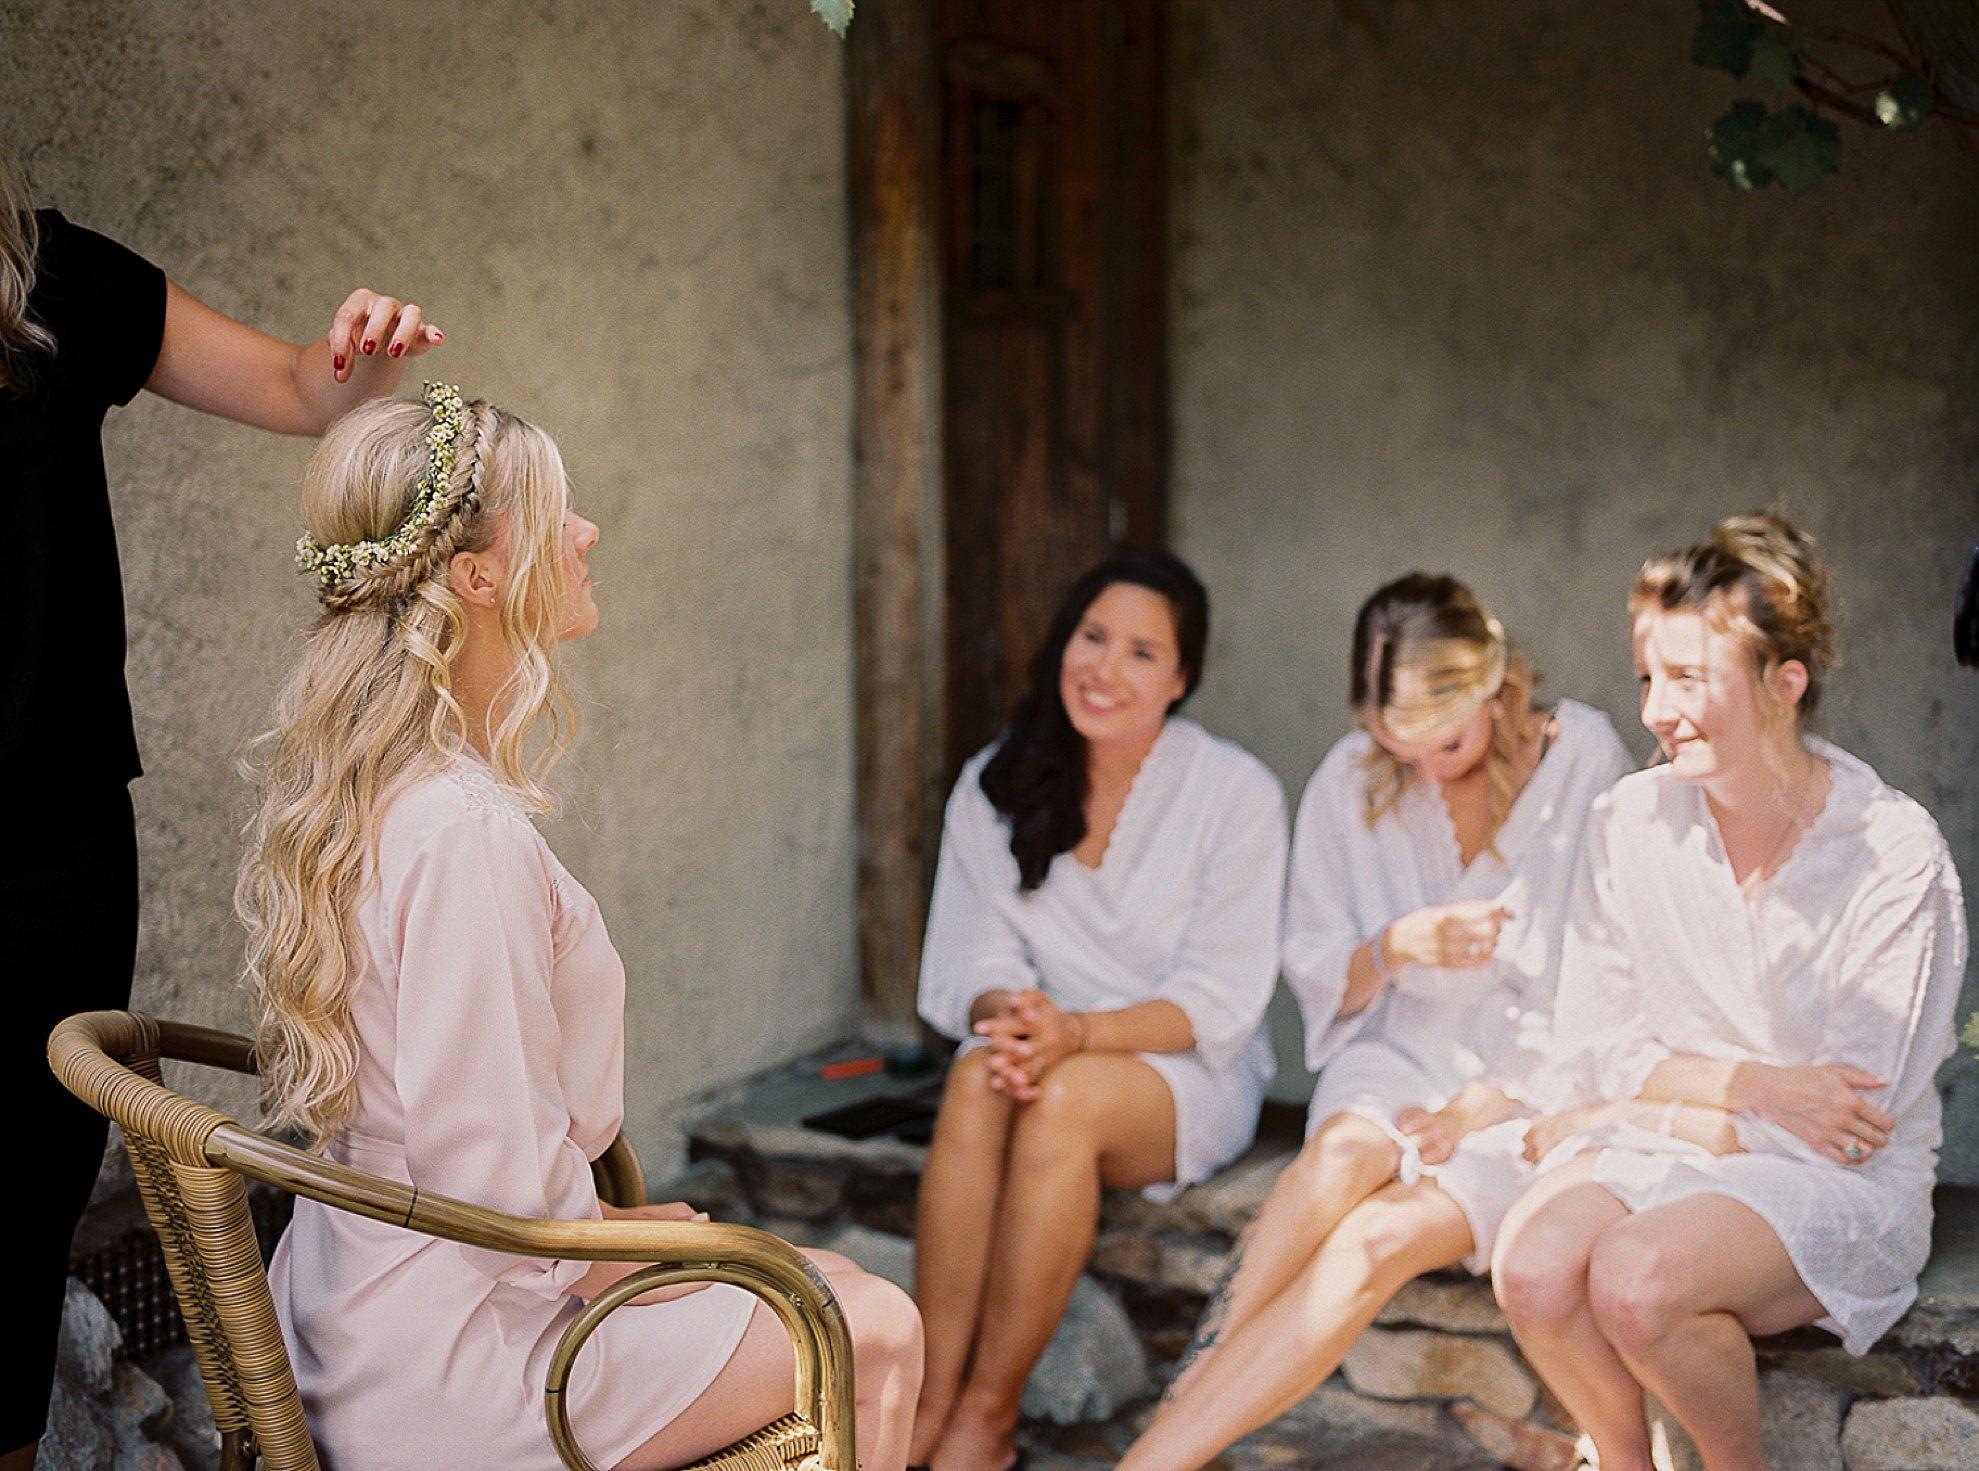 Amanda-Drost-Fotografie-Belgie-Photography-Wedding_0012.jpg